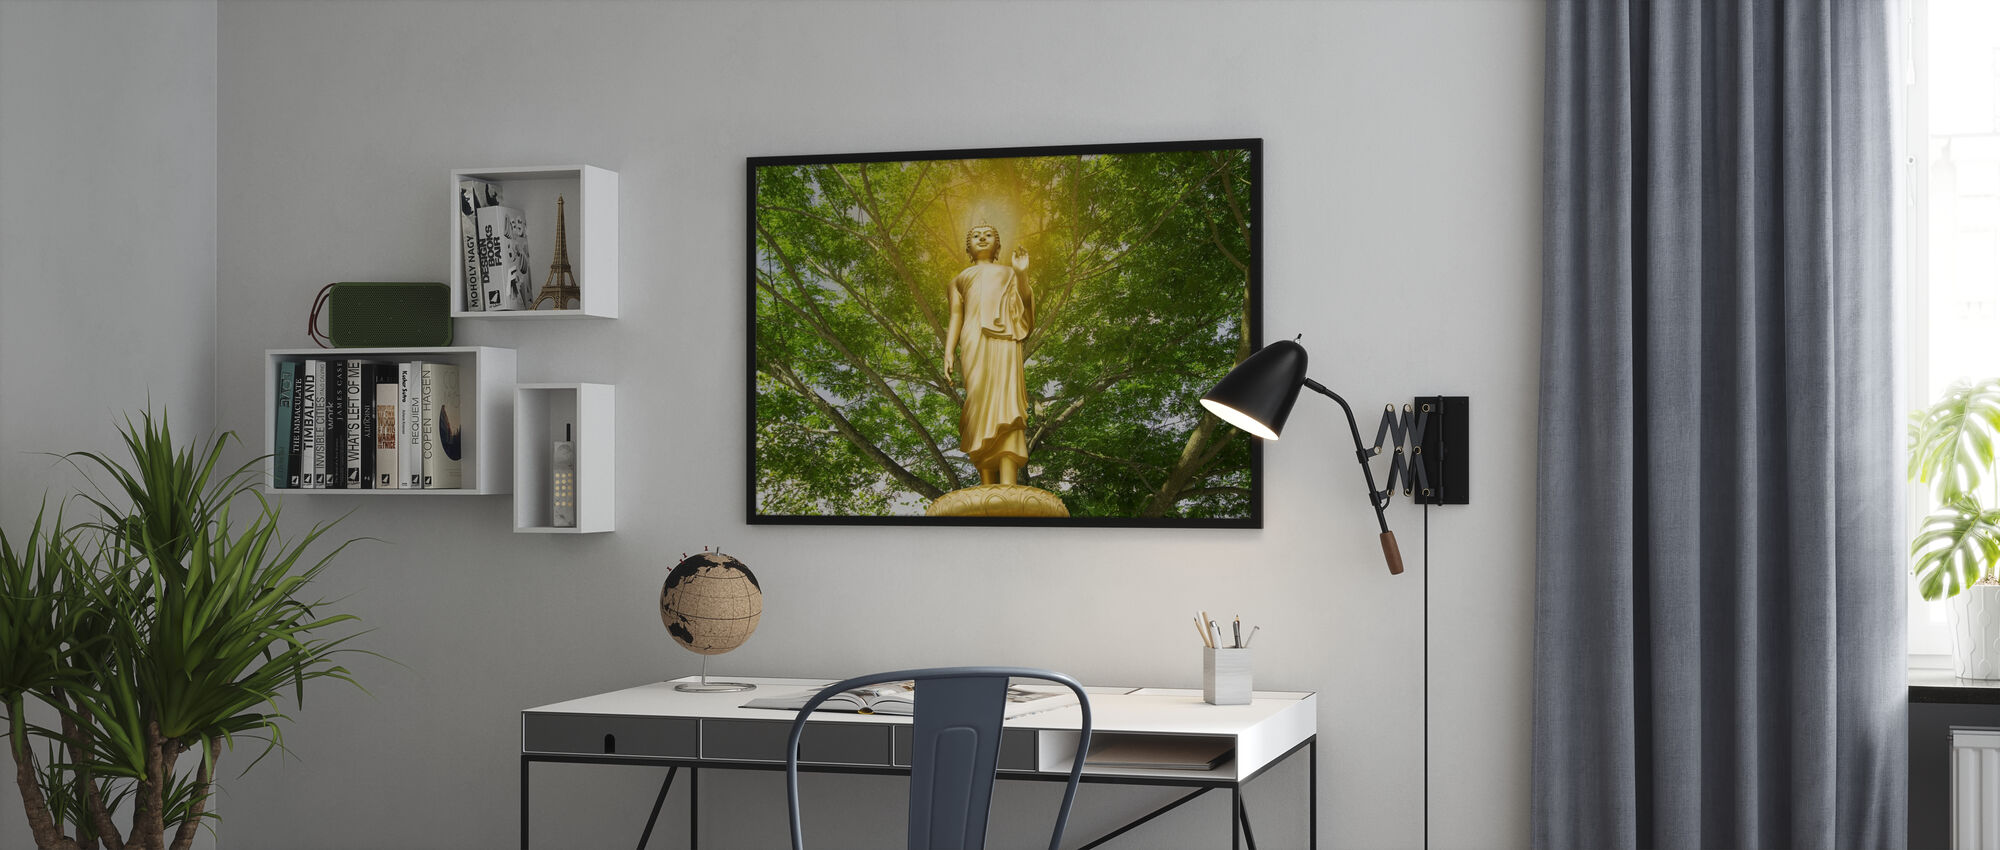 Statue des Buddha - Poster - Büro